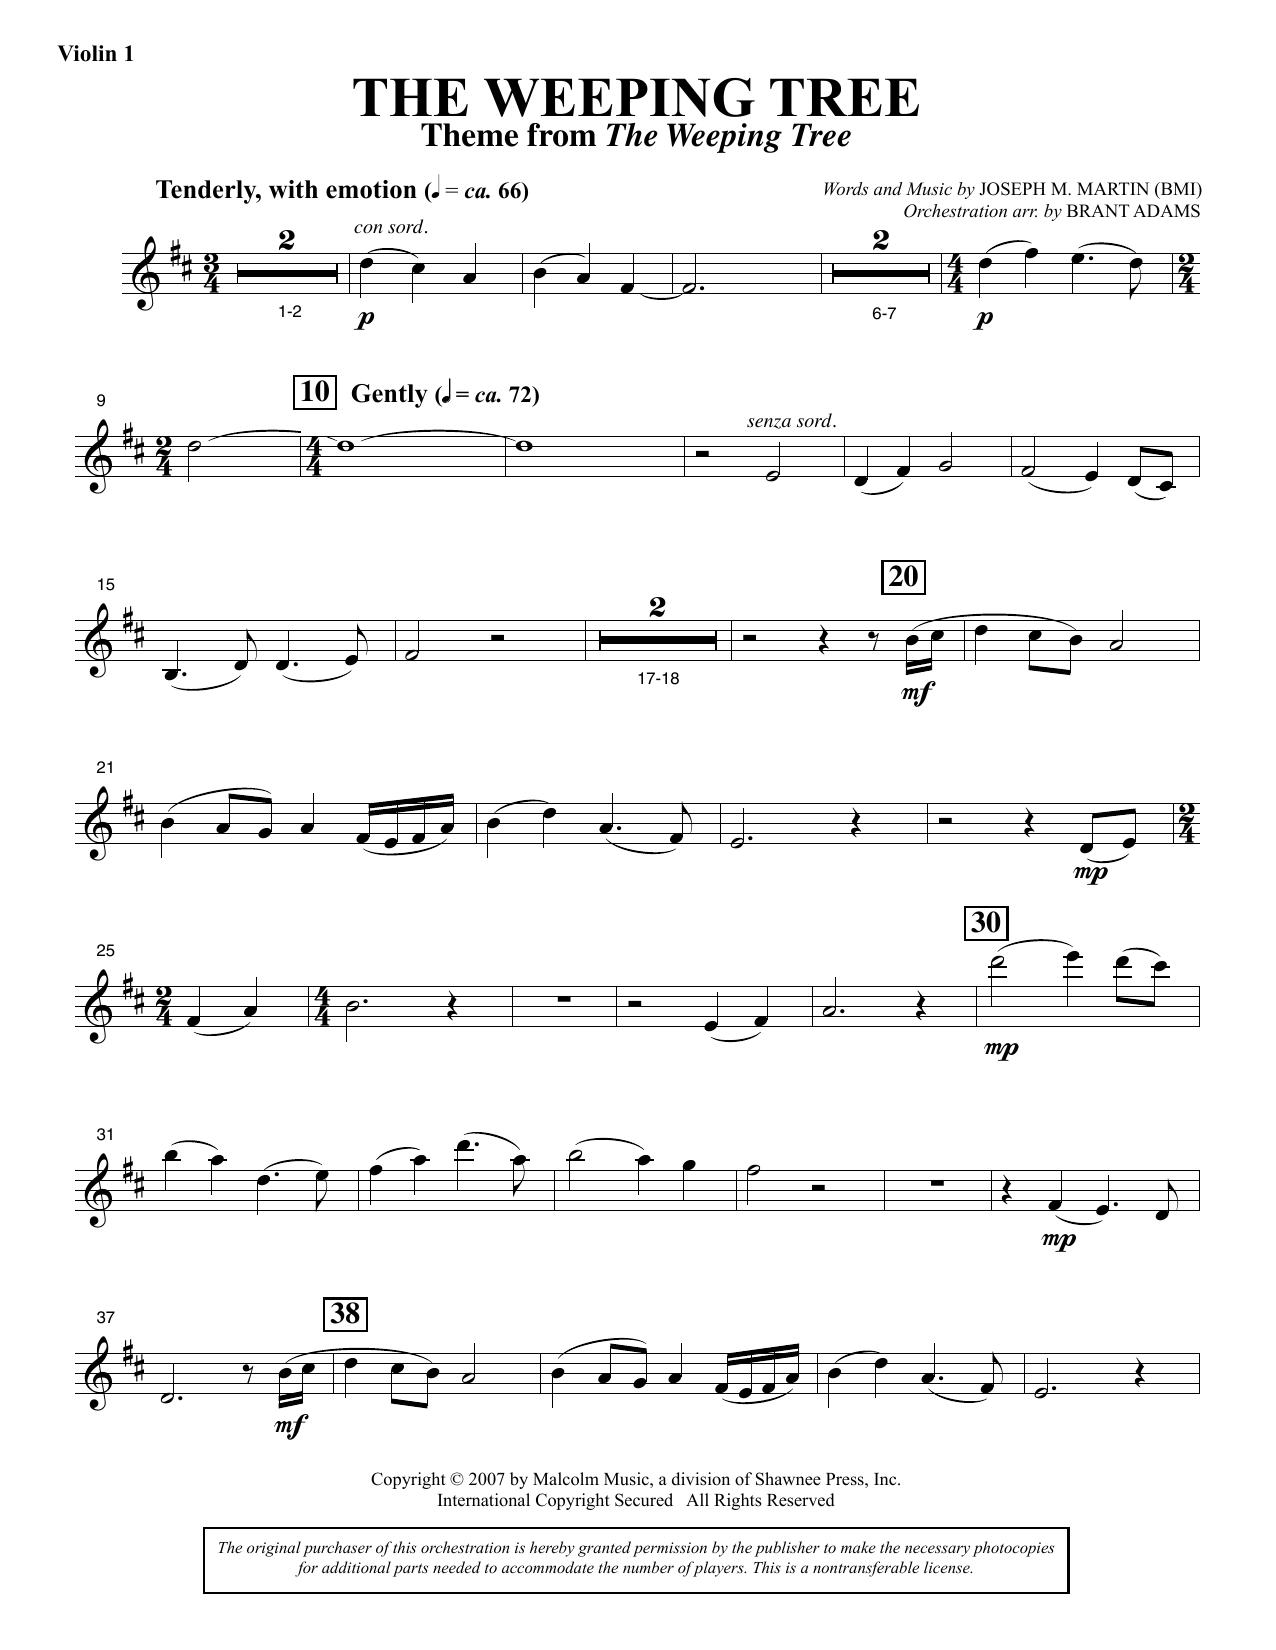 The Weeping Tree - Violin 1 Sheet Music